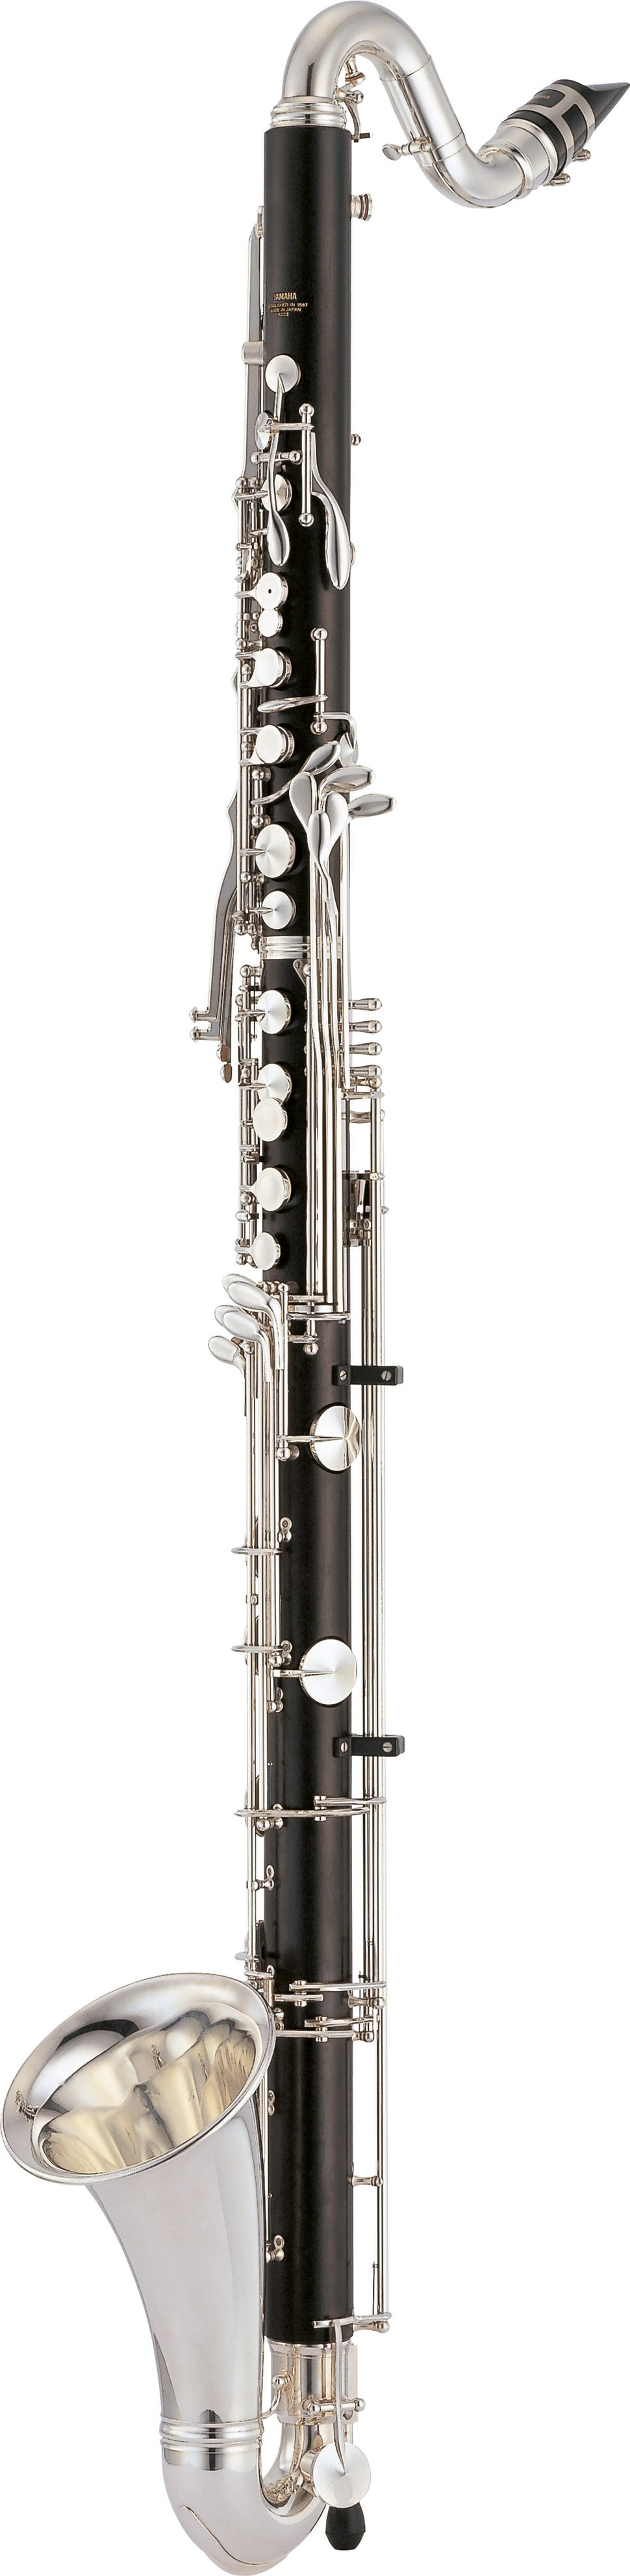 Yamaha Bass Clarinet YCL-622II